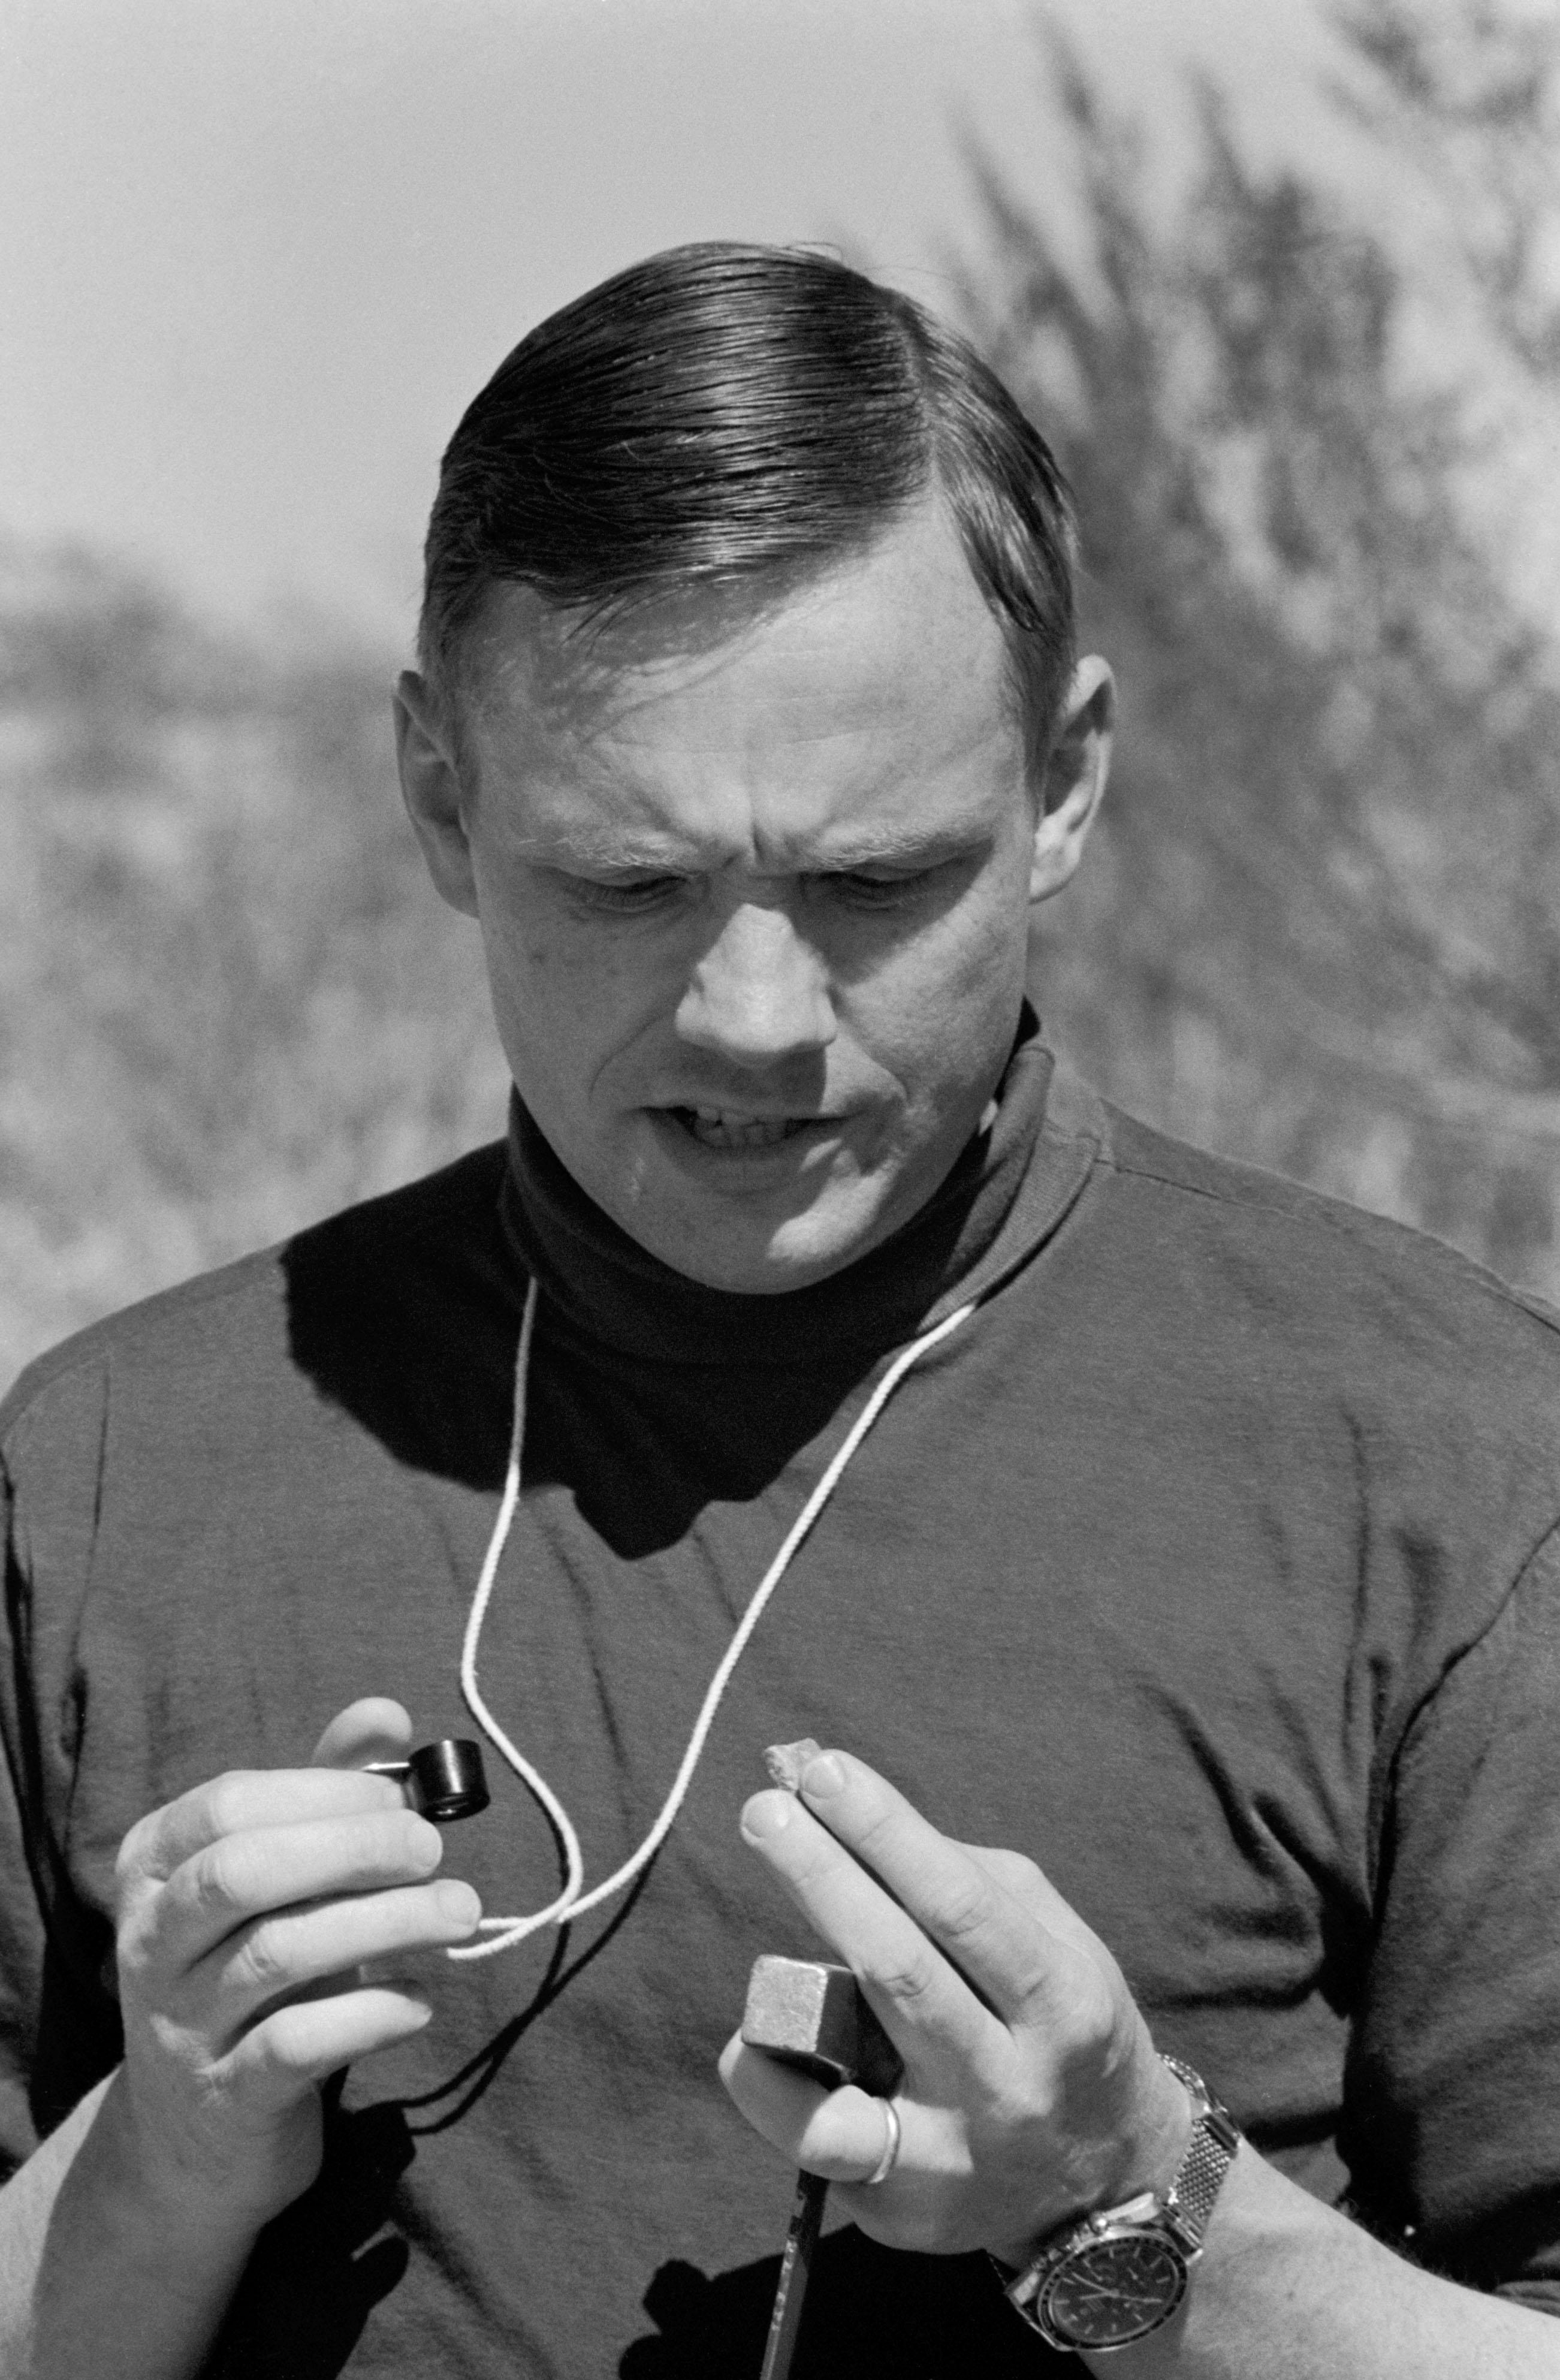 Neil Armstrong Studies Rock Sample